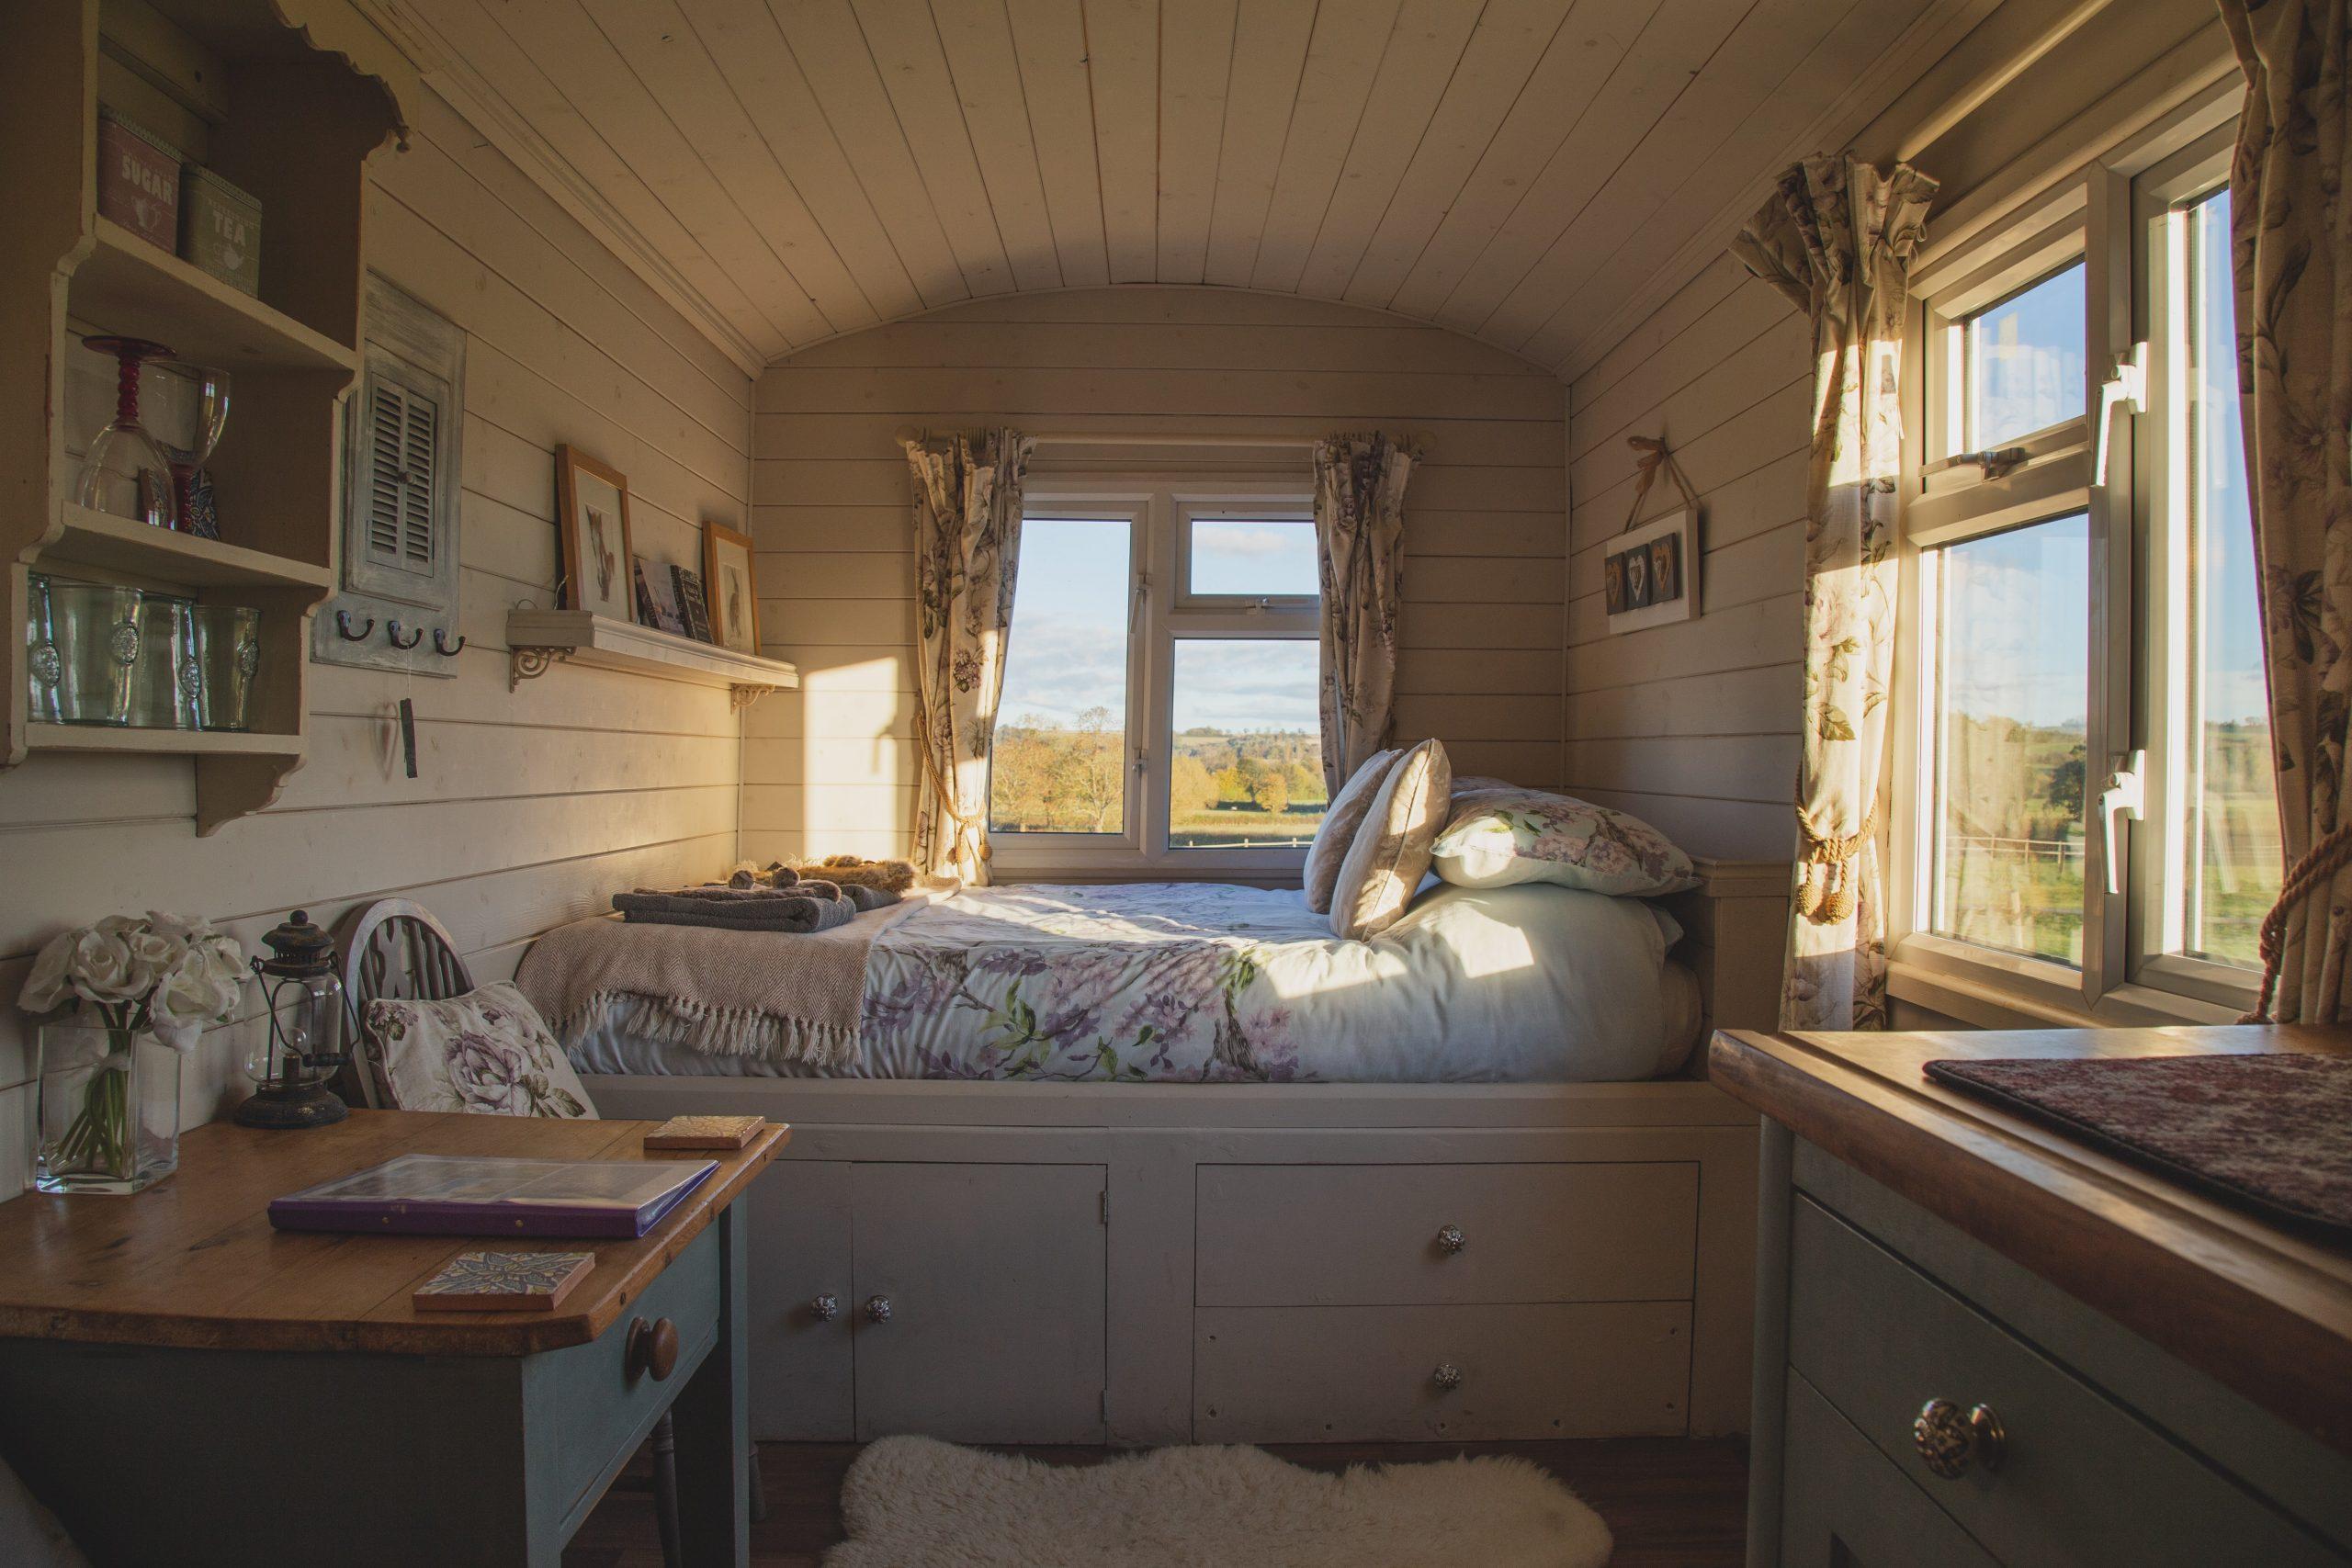 Tiny House Urlaub Inneneinrichtung